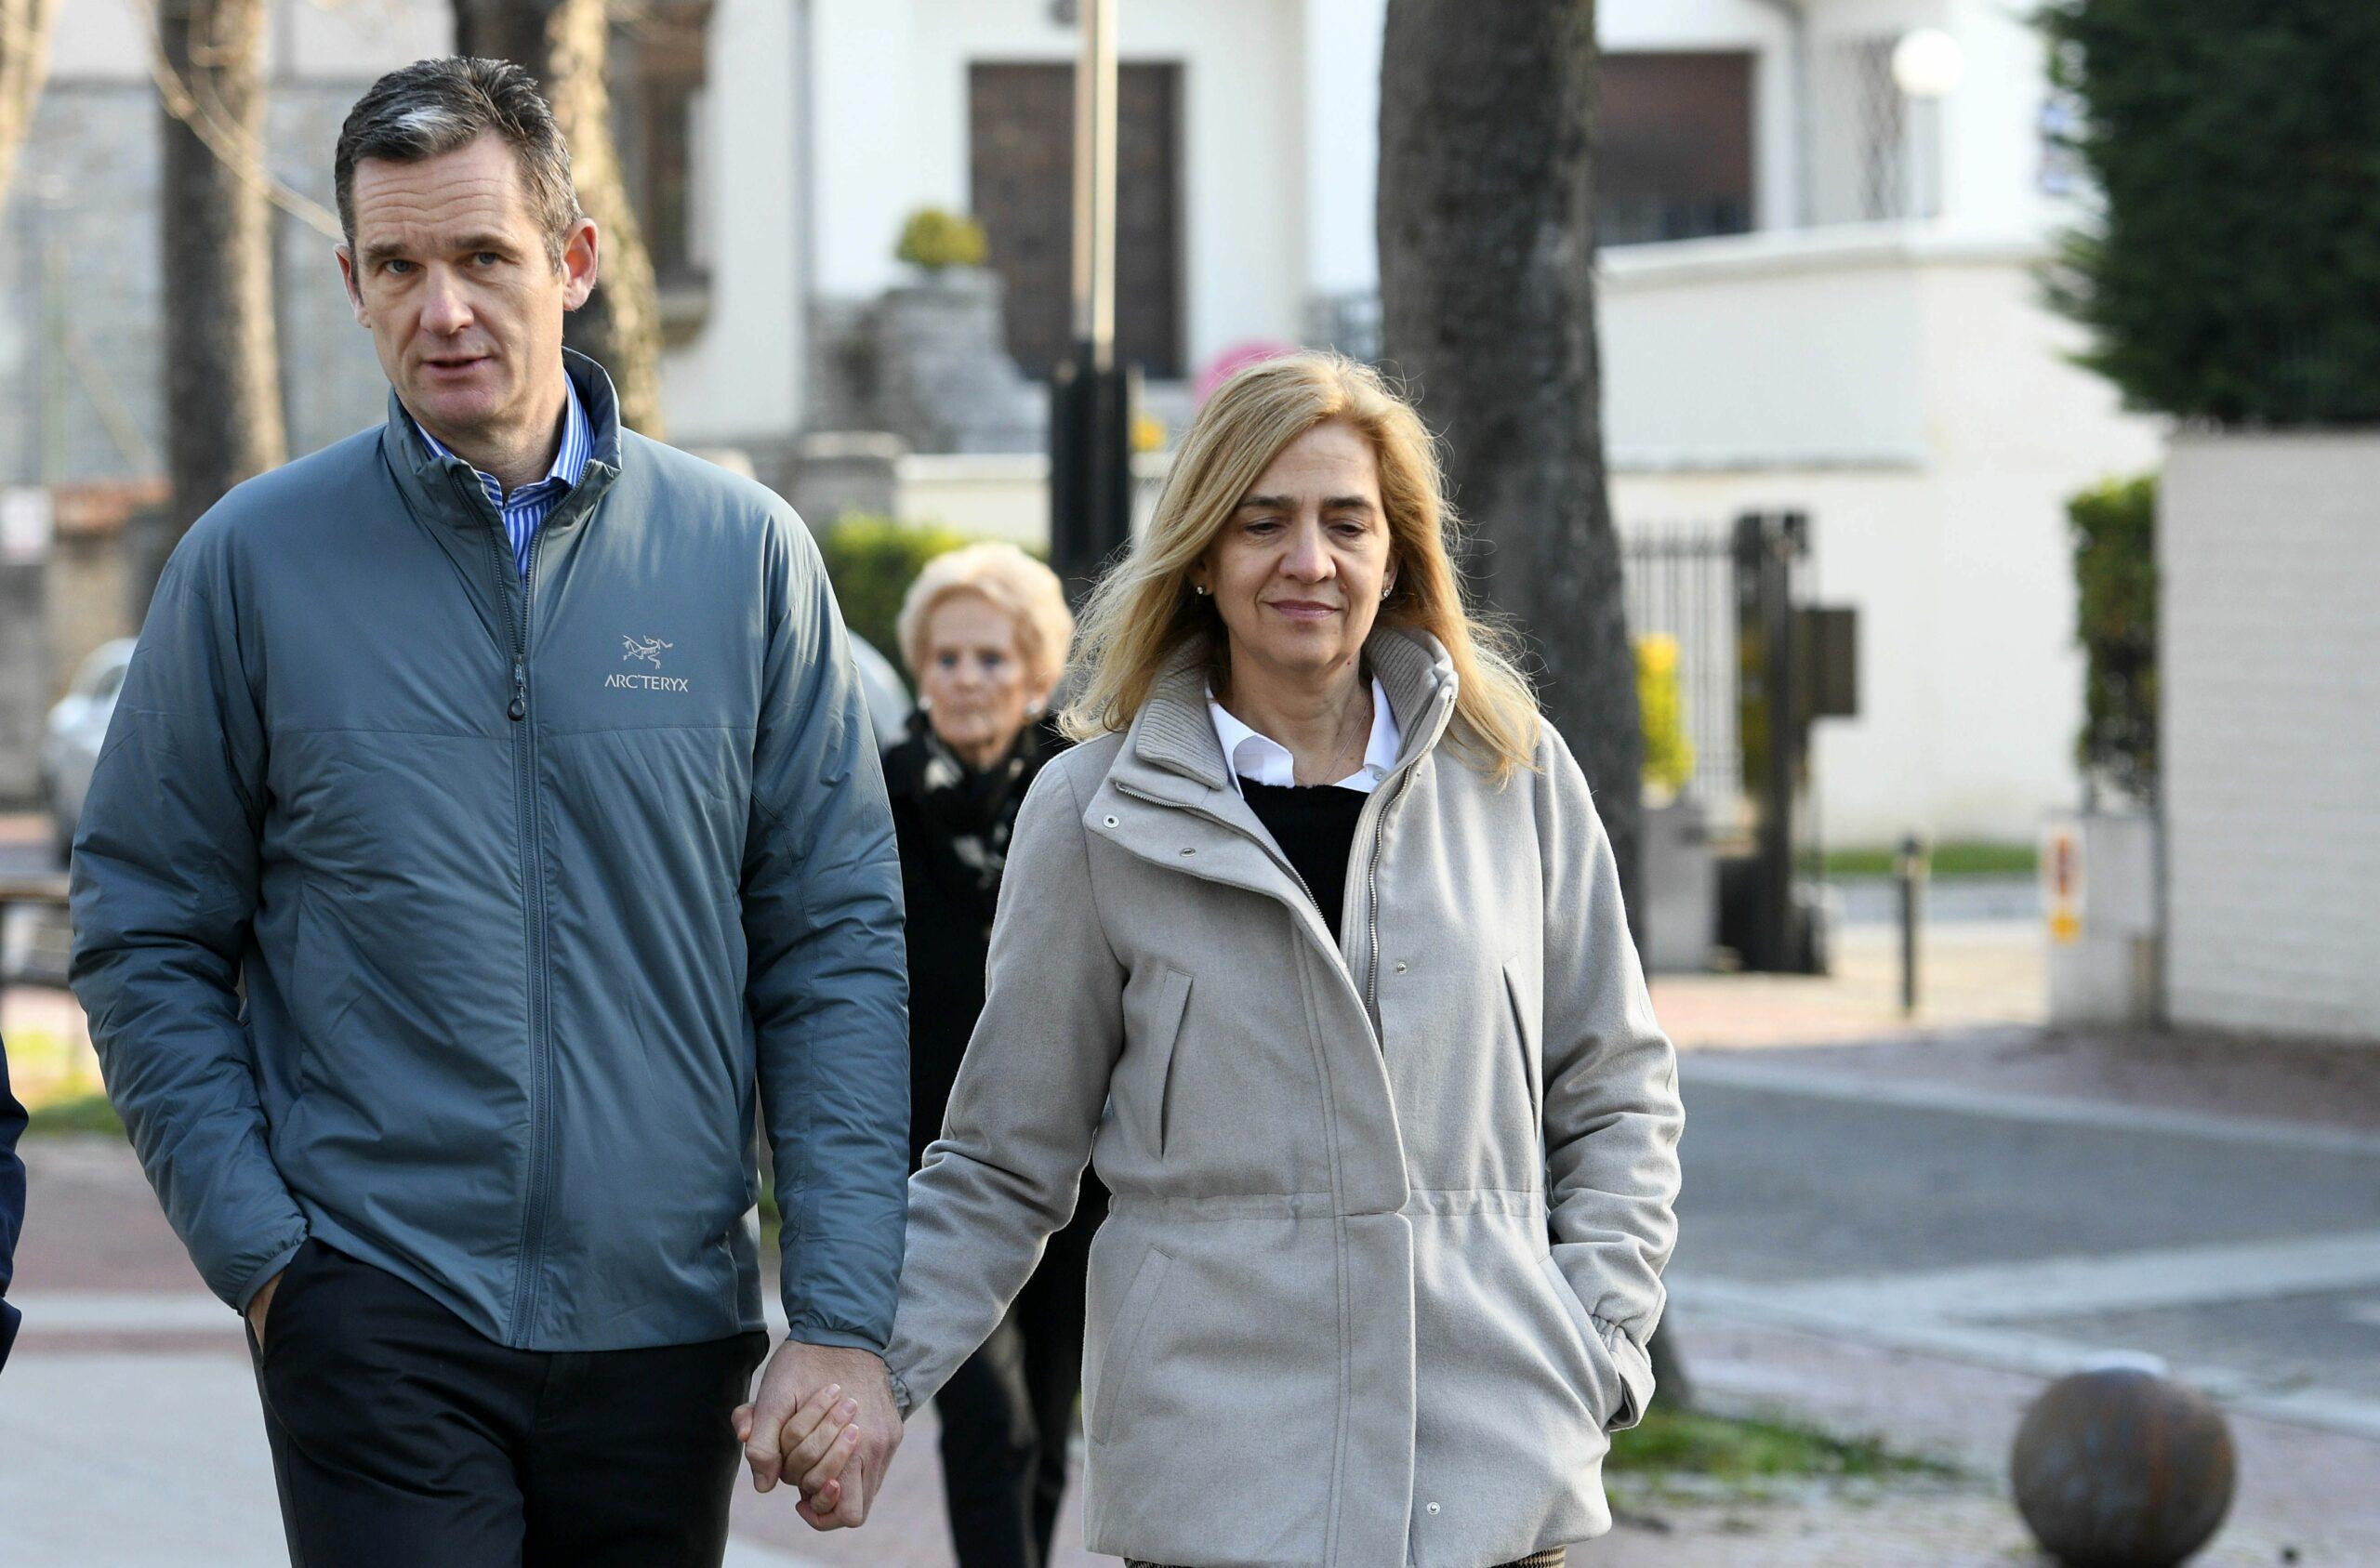 Iñaki Urdangarin i la infanta Cristina passegen per Vitòria  Europa Press